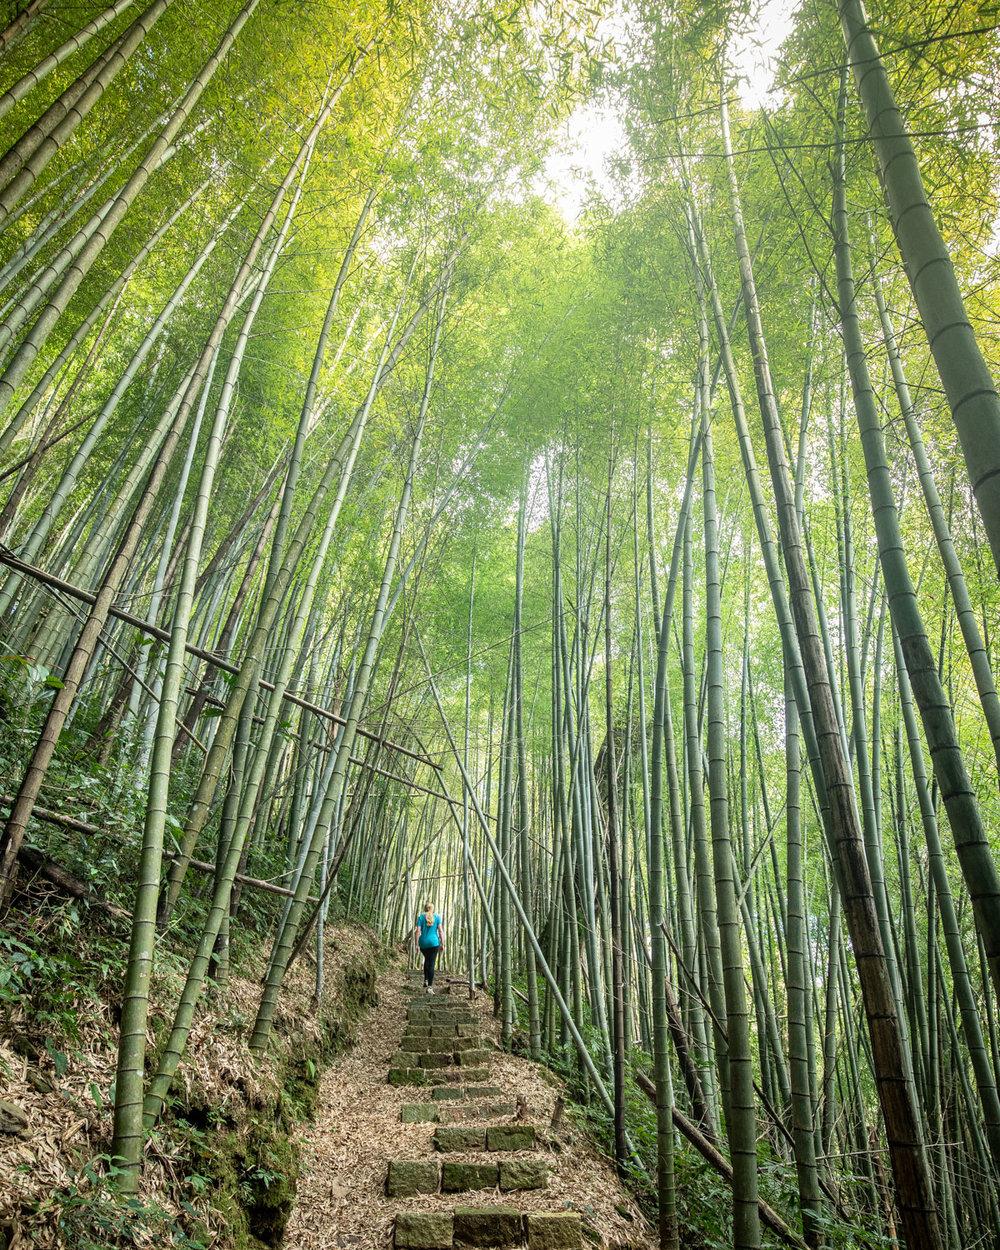 Fenrui Historic Trail - Bamboo Forest